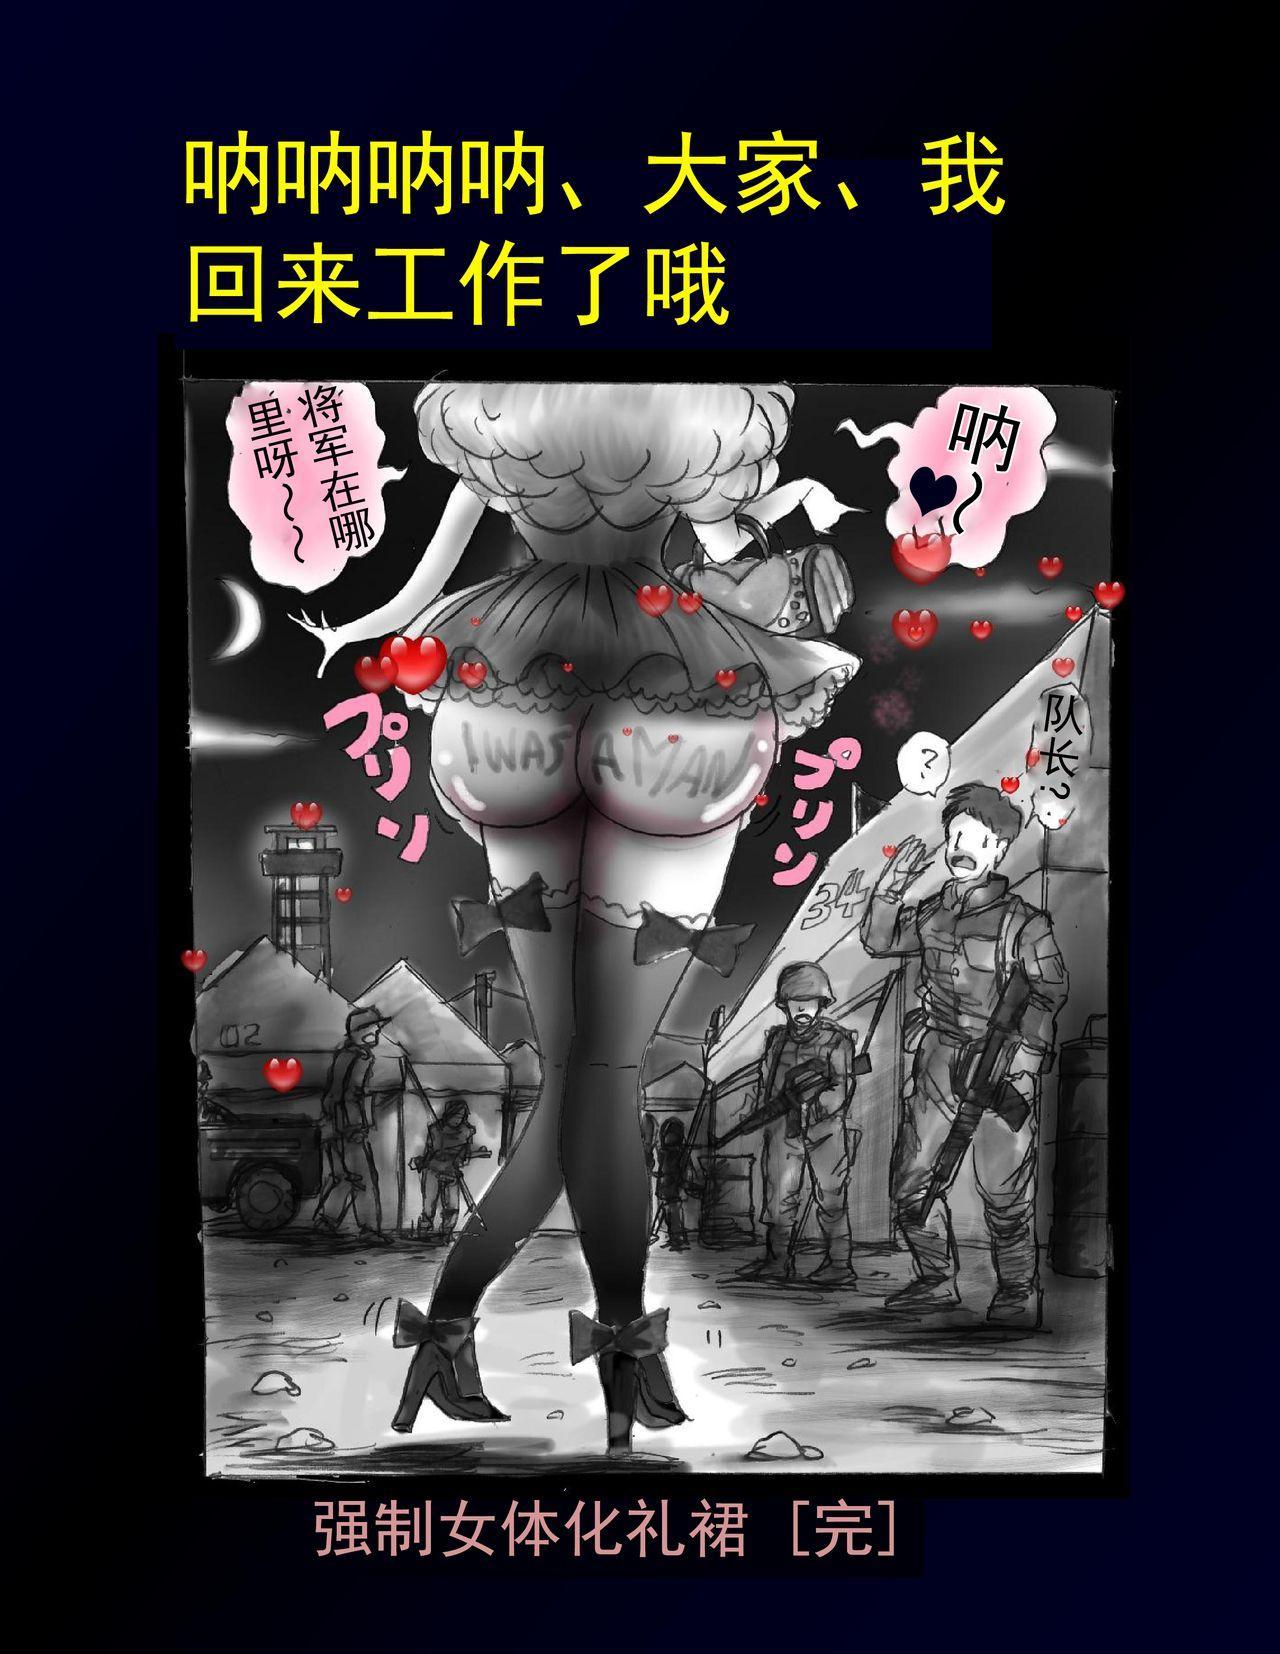 Kyousei Nyotaika Dress 82